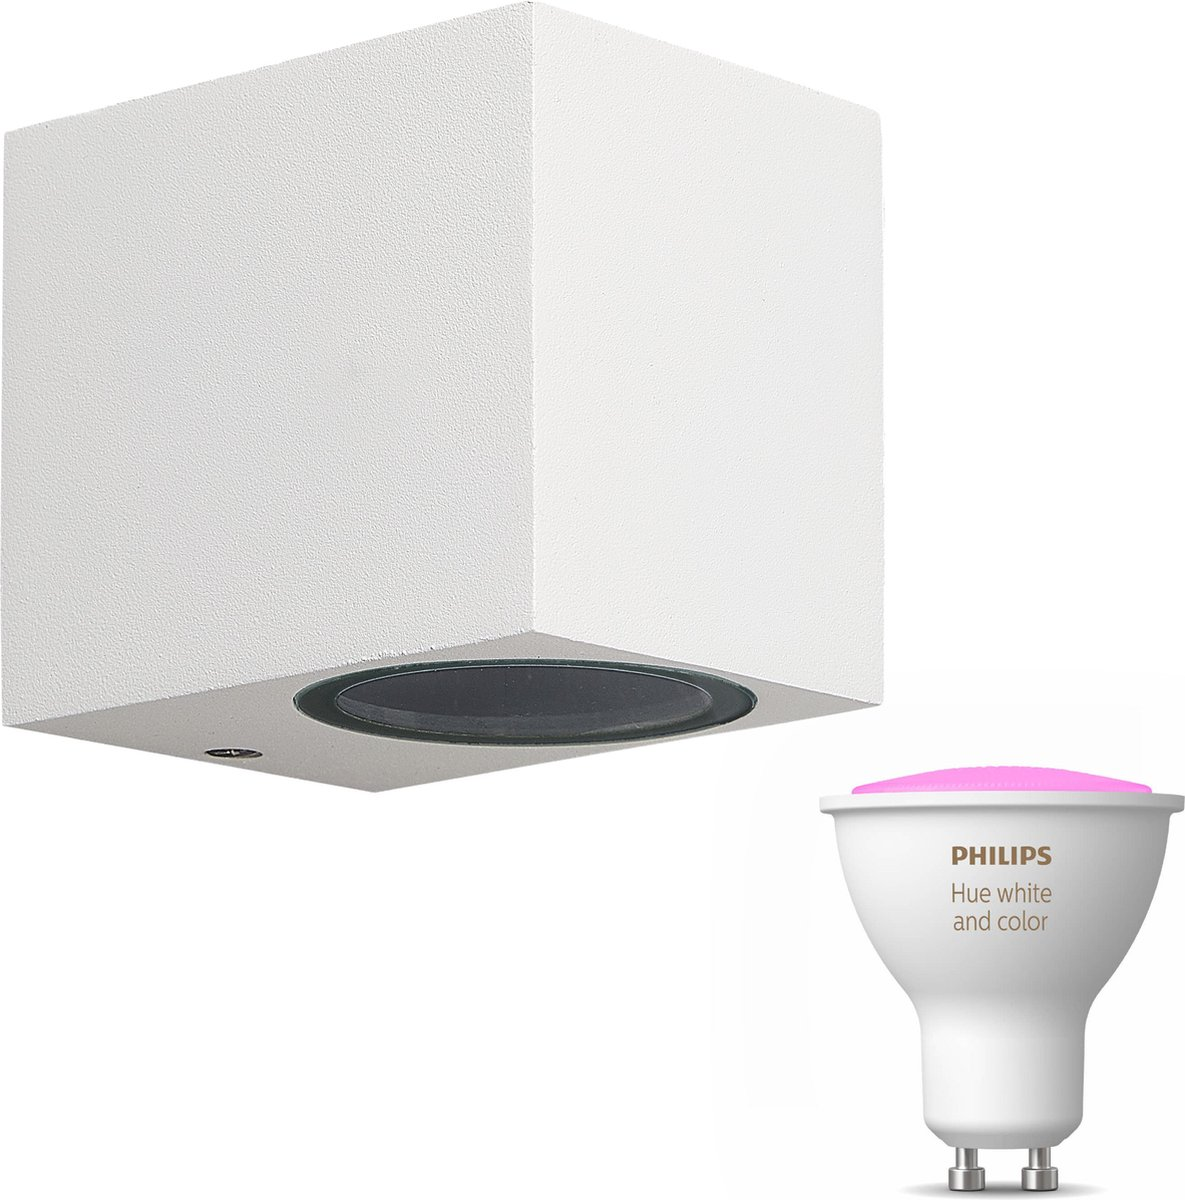 Mantra Kandachu wandlamp vierkant - wit - 1 lichtpunt - Incl. Philips Hue White & Color Ambiance Gu10 (geschikt voor buitengebruik)